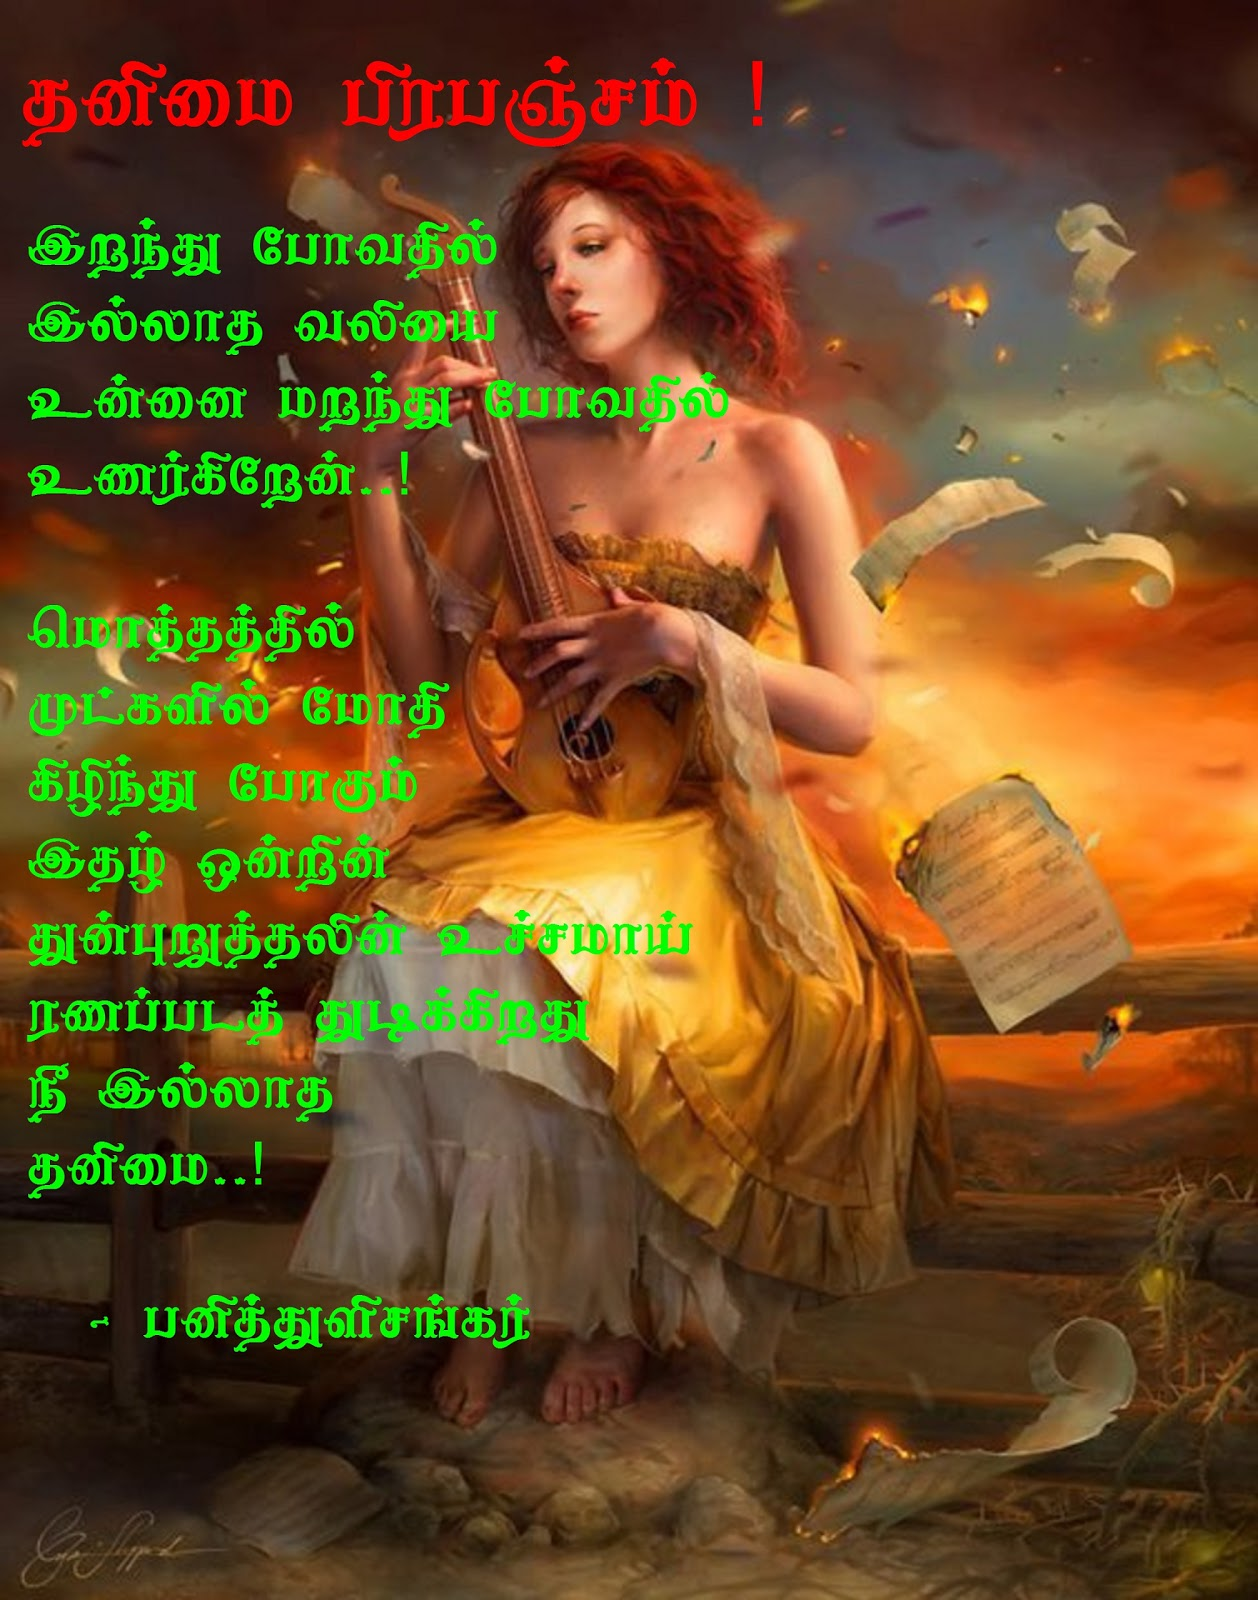 tamil kadhal kavithaigal facebook kootation com tamil kavithaigal